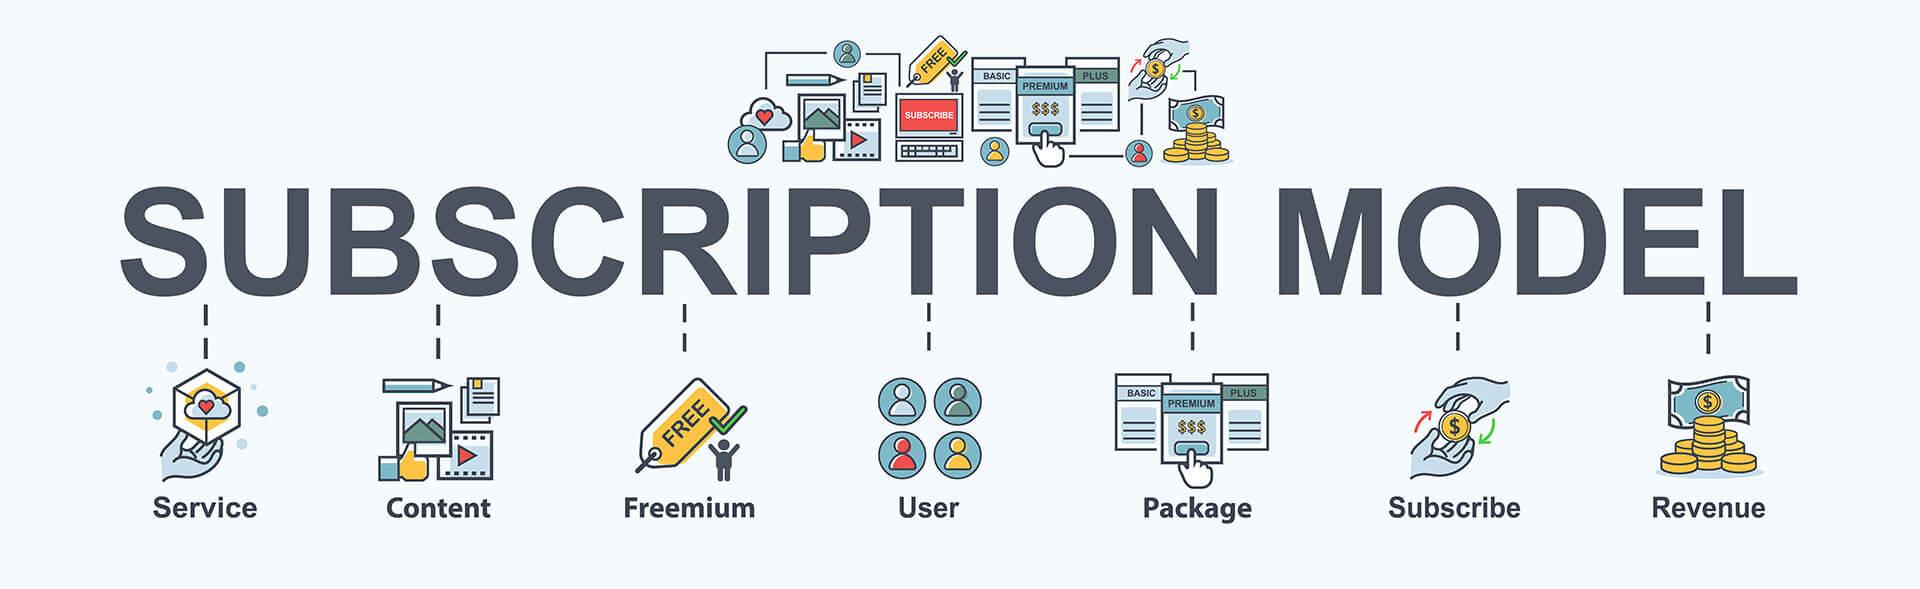 Subscription-model